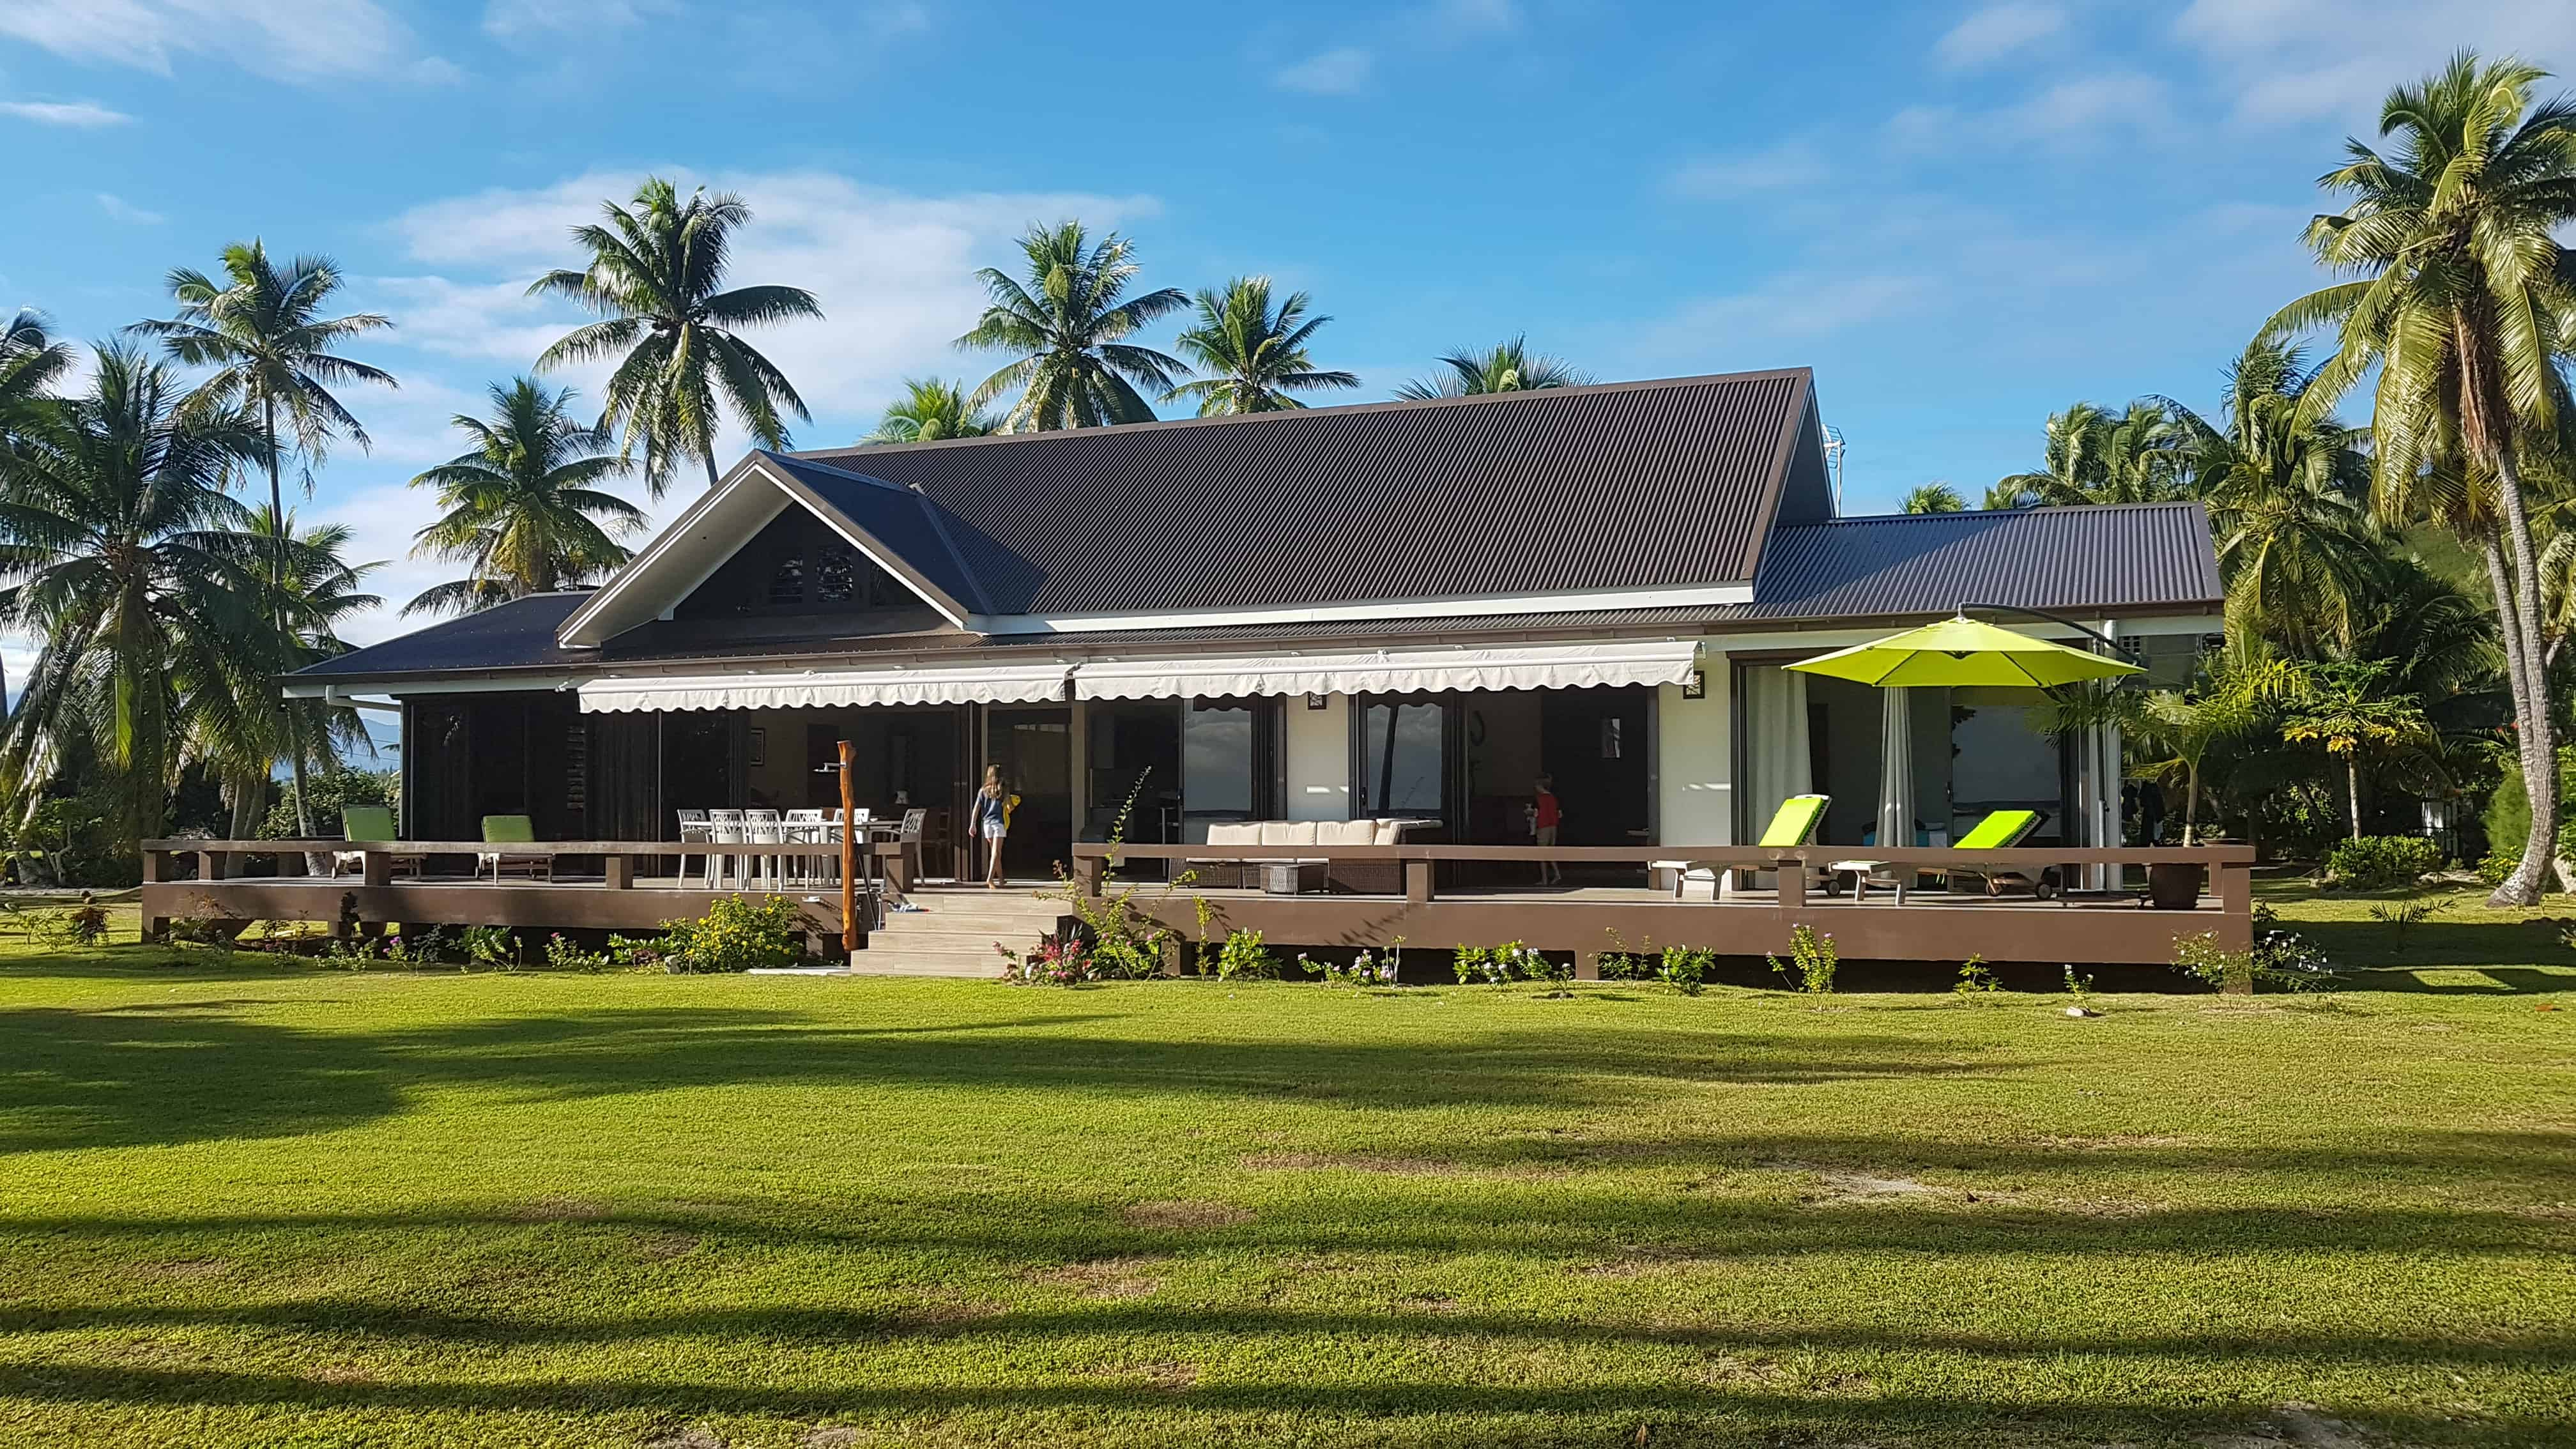 https://tahititourisme.mx/wp-content/uploads/2018/09/Villa-Tiarenui-by-Tahiti-Homes-®-a-Moorea-4.jpg